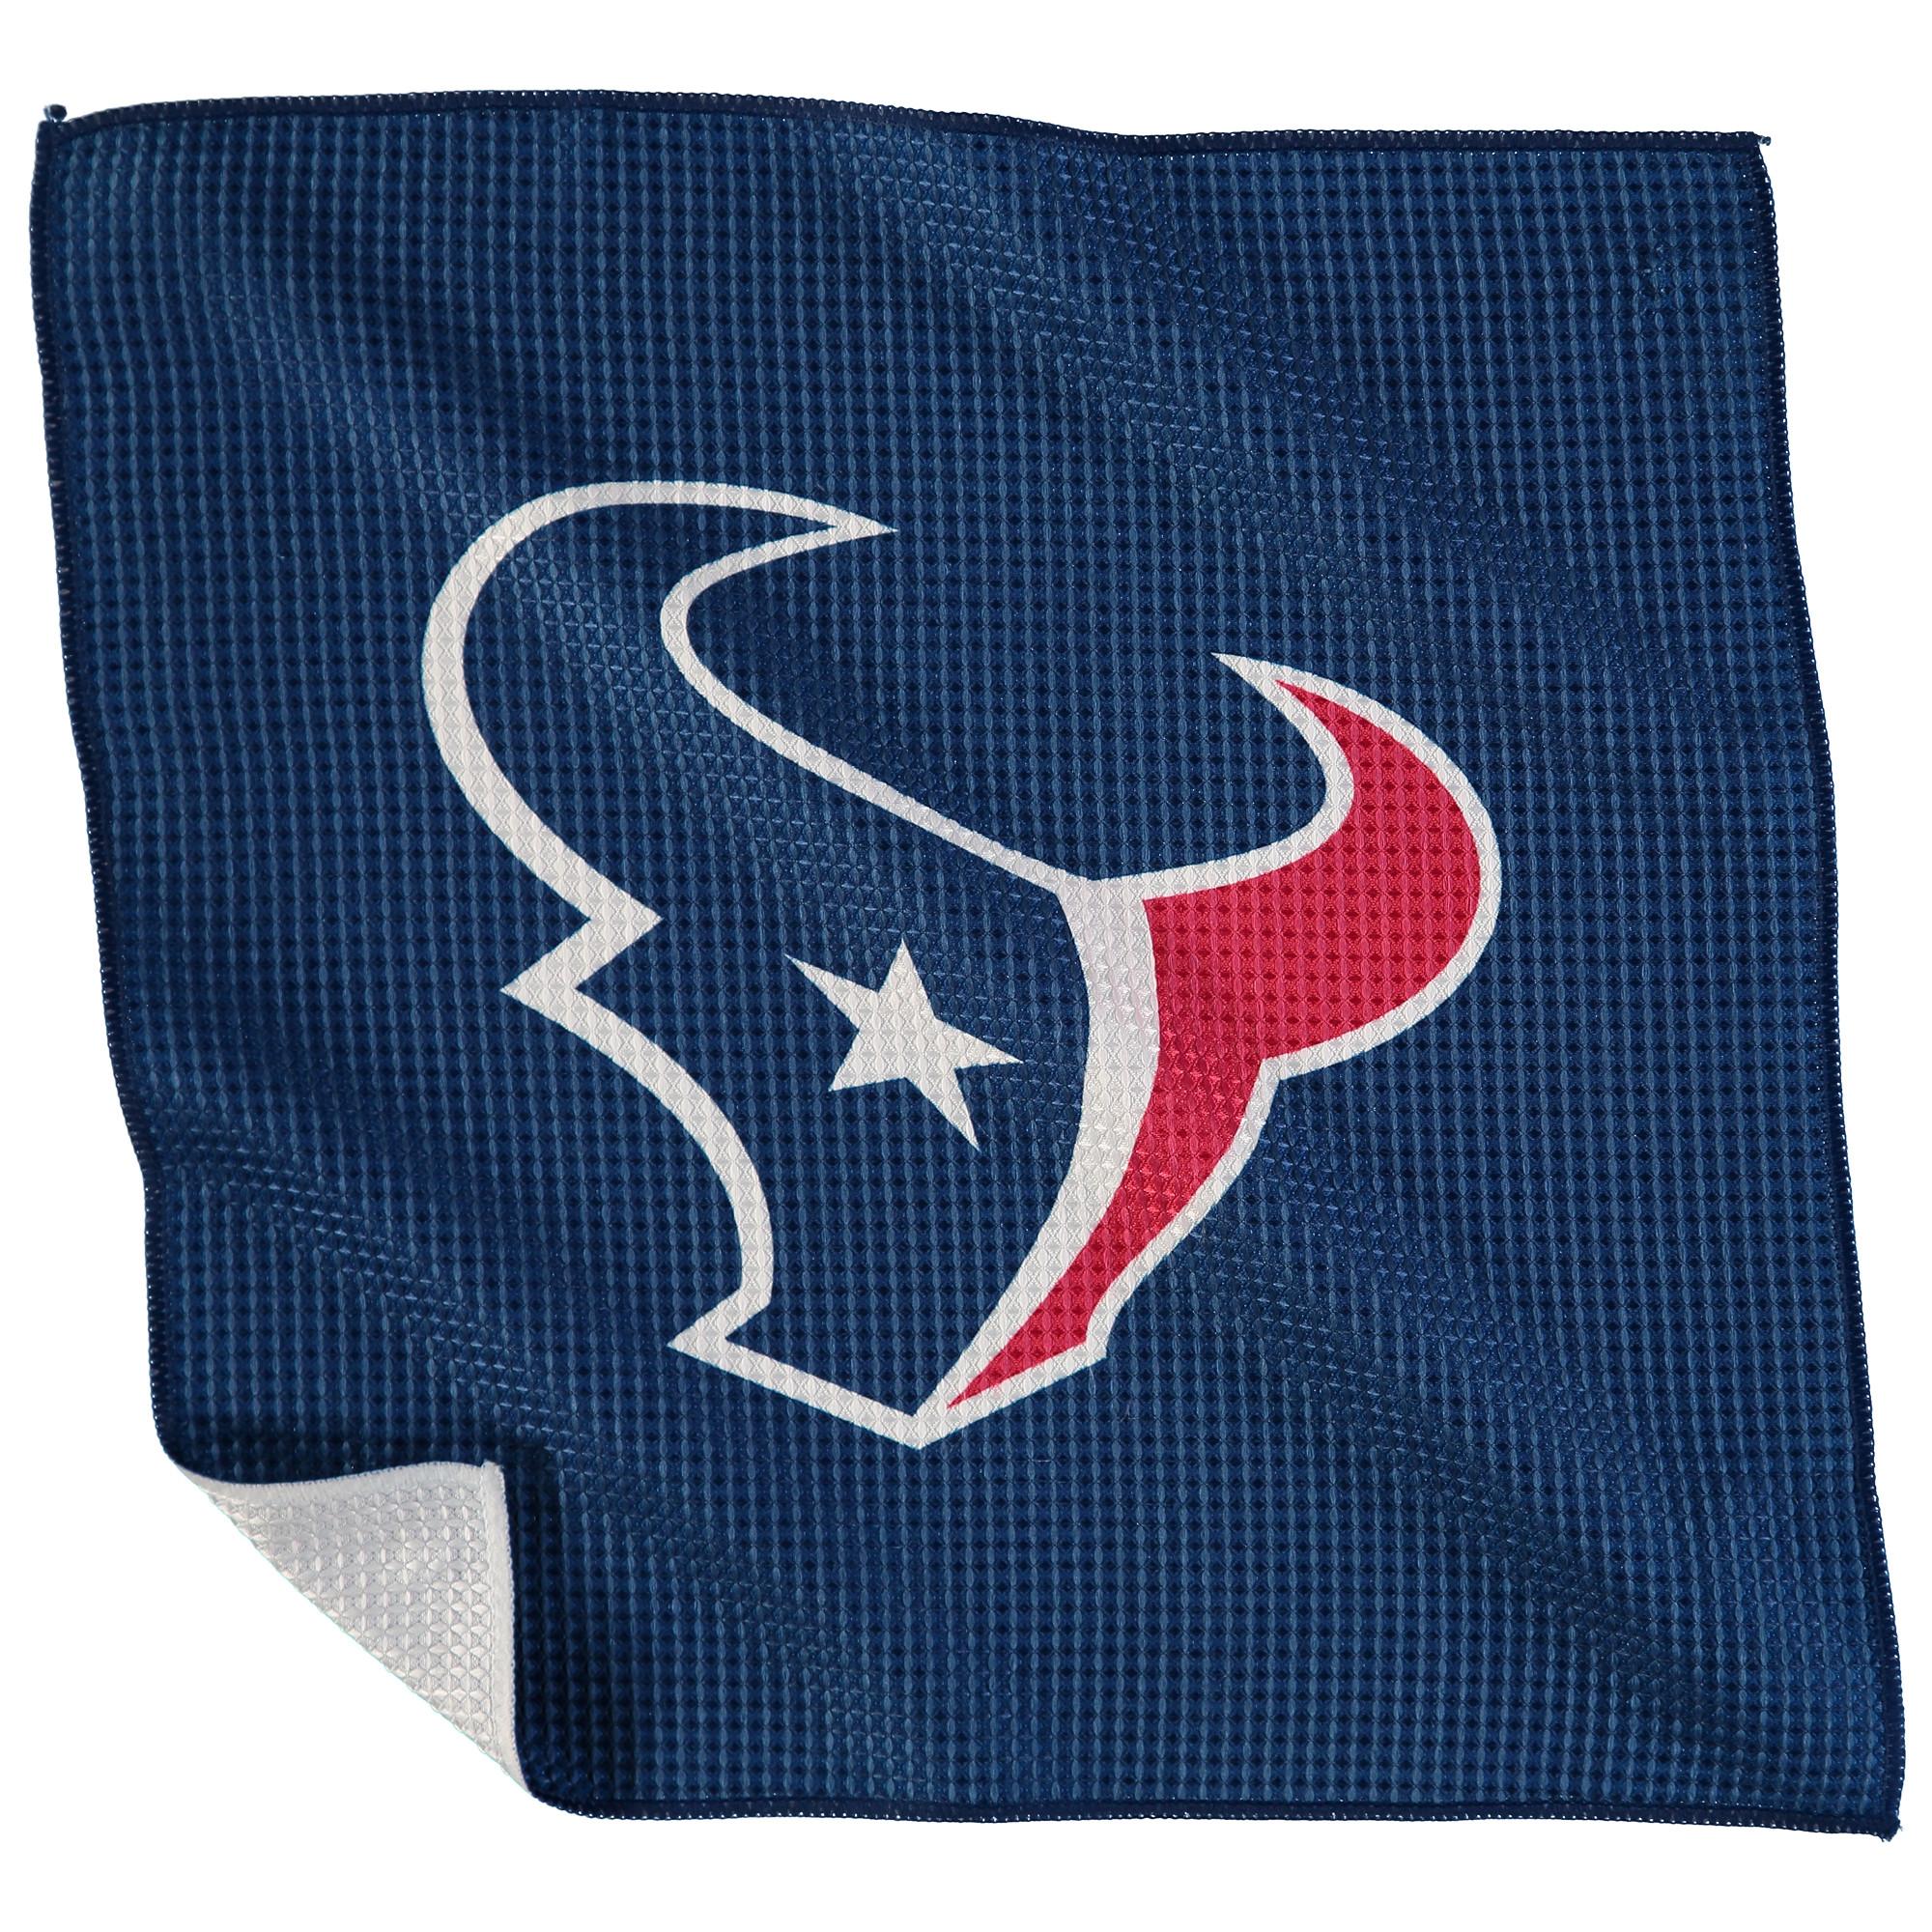 "Houston Texans 16"" x 16"" Microfiber Towel - No Size"